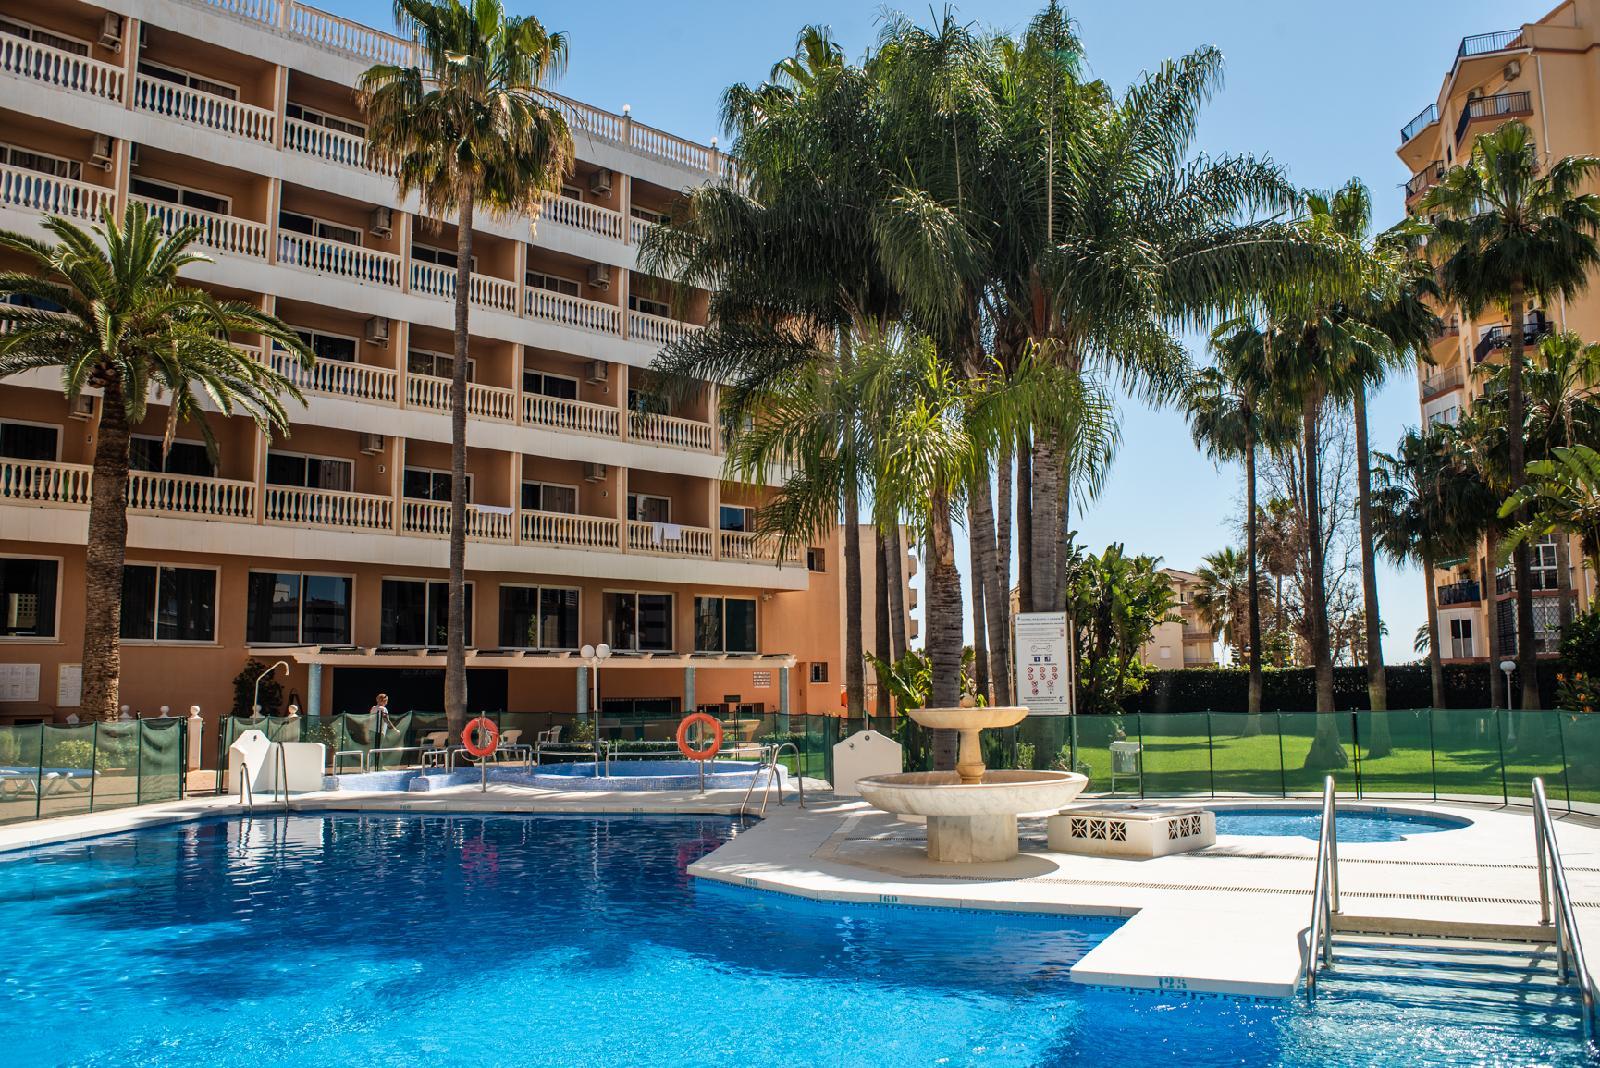 Hotel parasol garden em torremolinos costa do sol for K sol piscinas